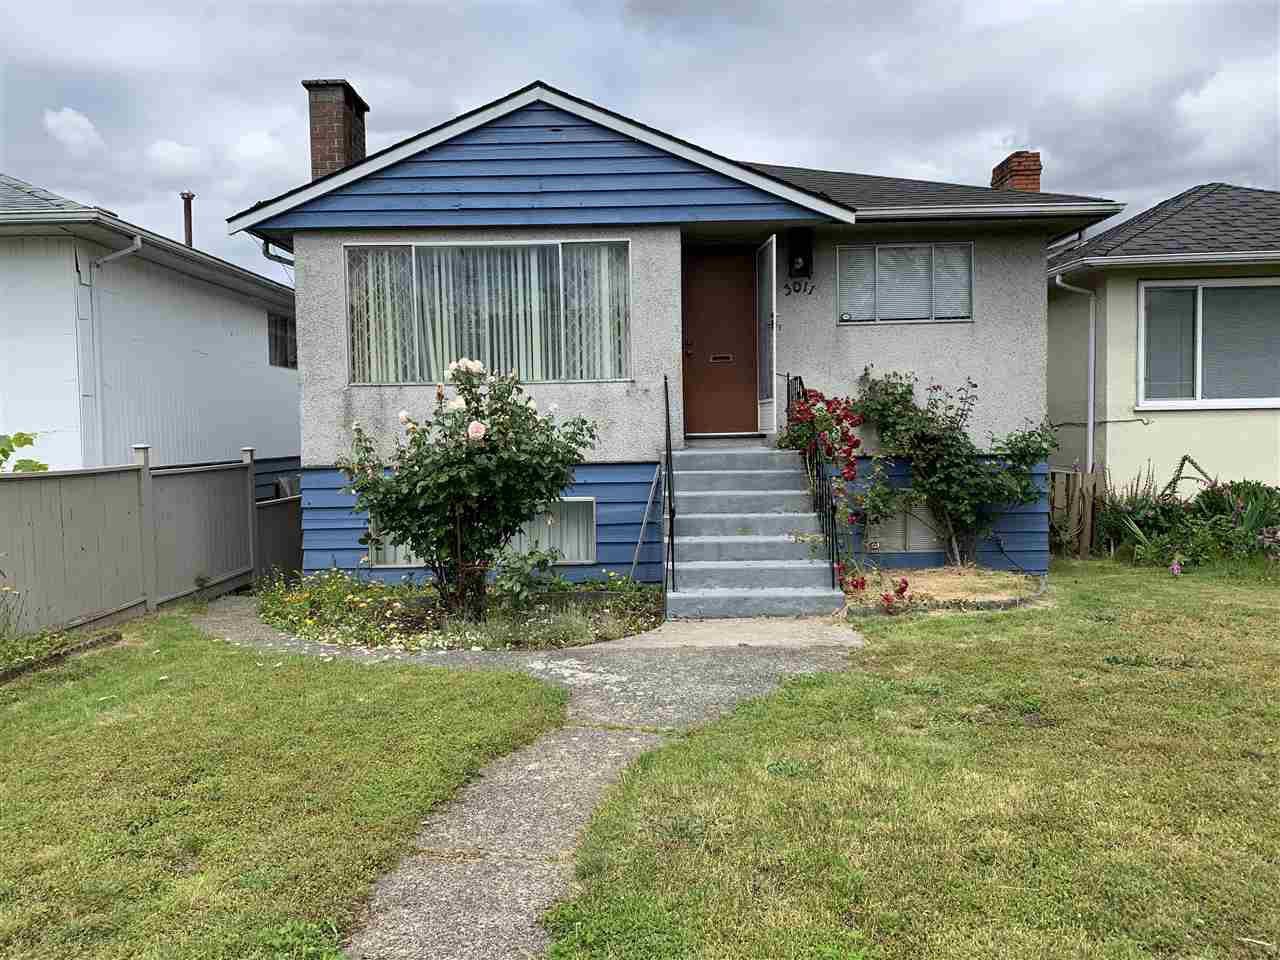 "Main Photo: 3011 E 20TH Avenue in Vancouver: Renfrew Heights House for sale in ""RENFREW HEIGHTS"" (Vancouver East)  : MLS®# R2468118"